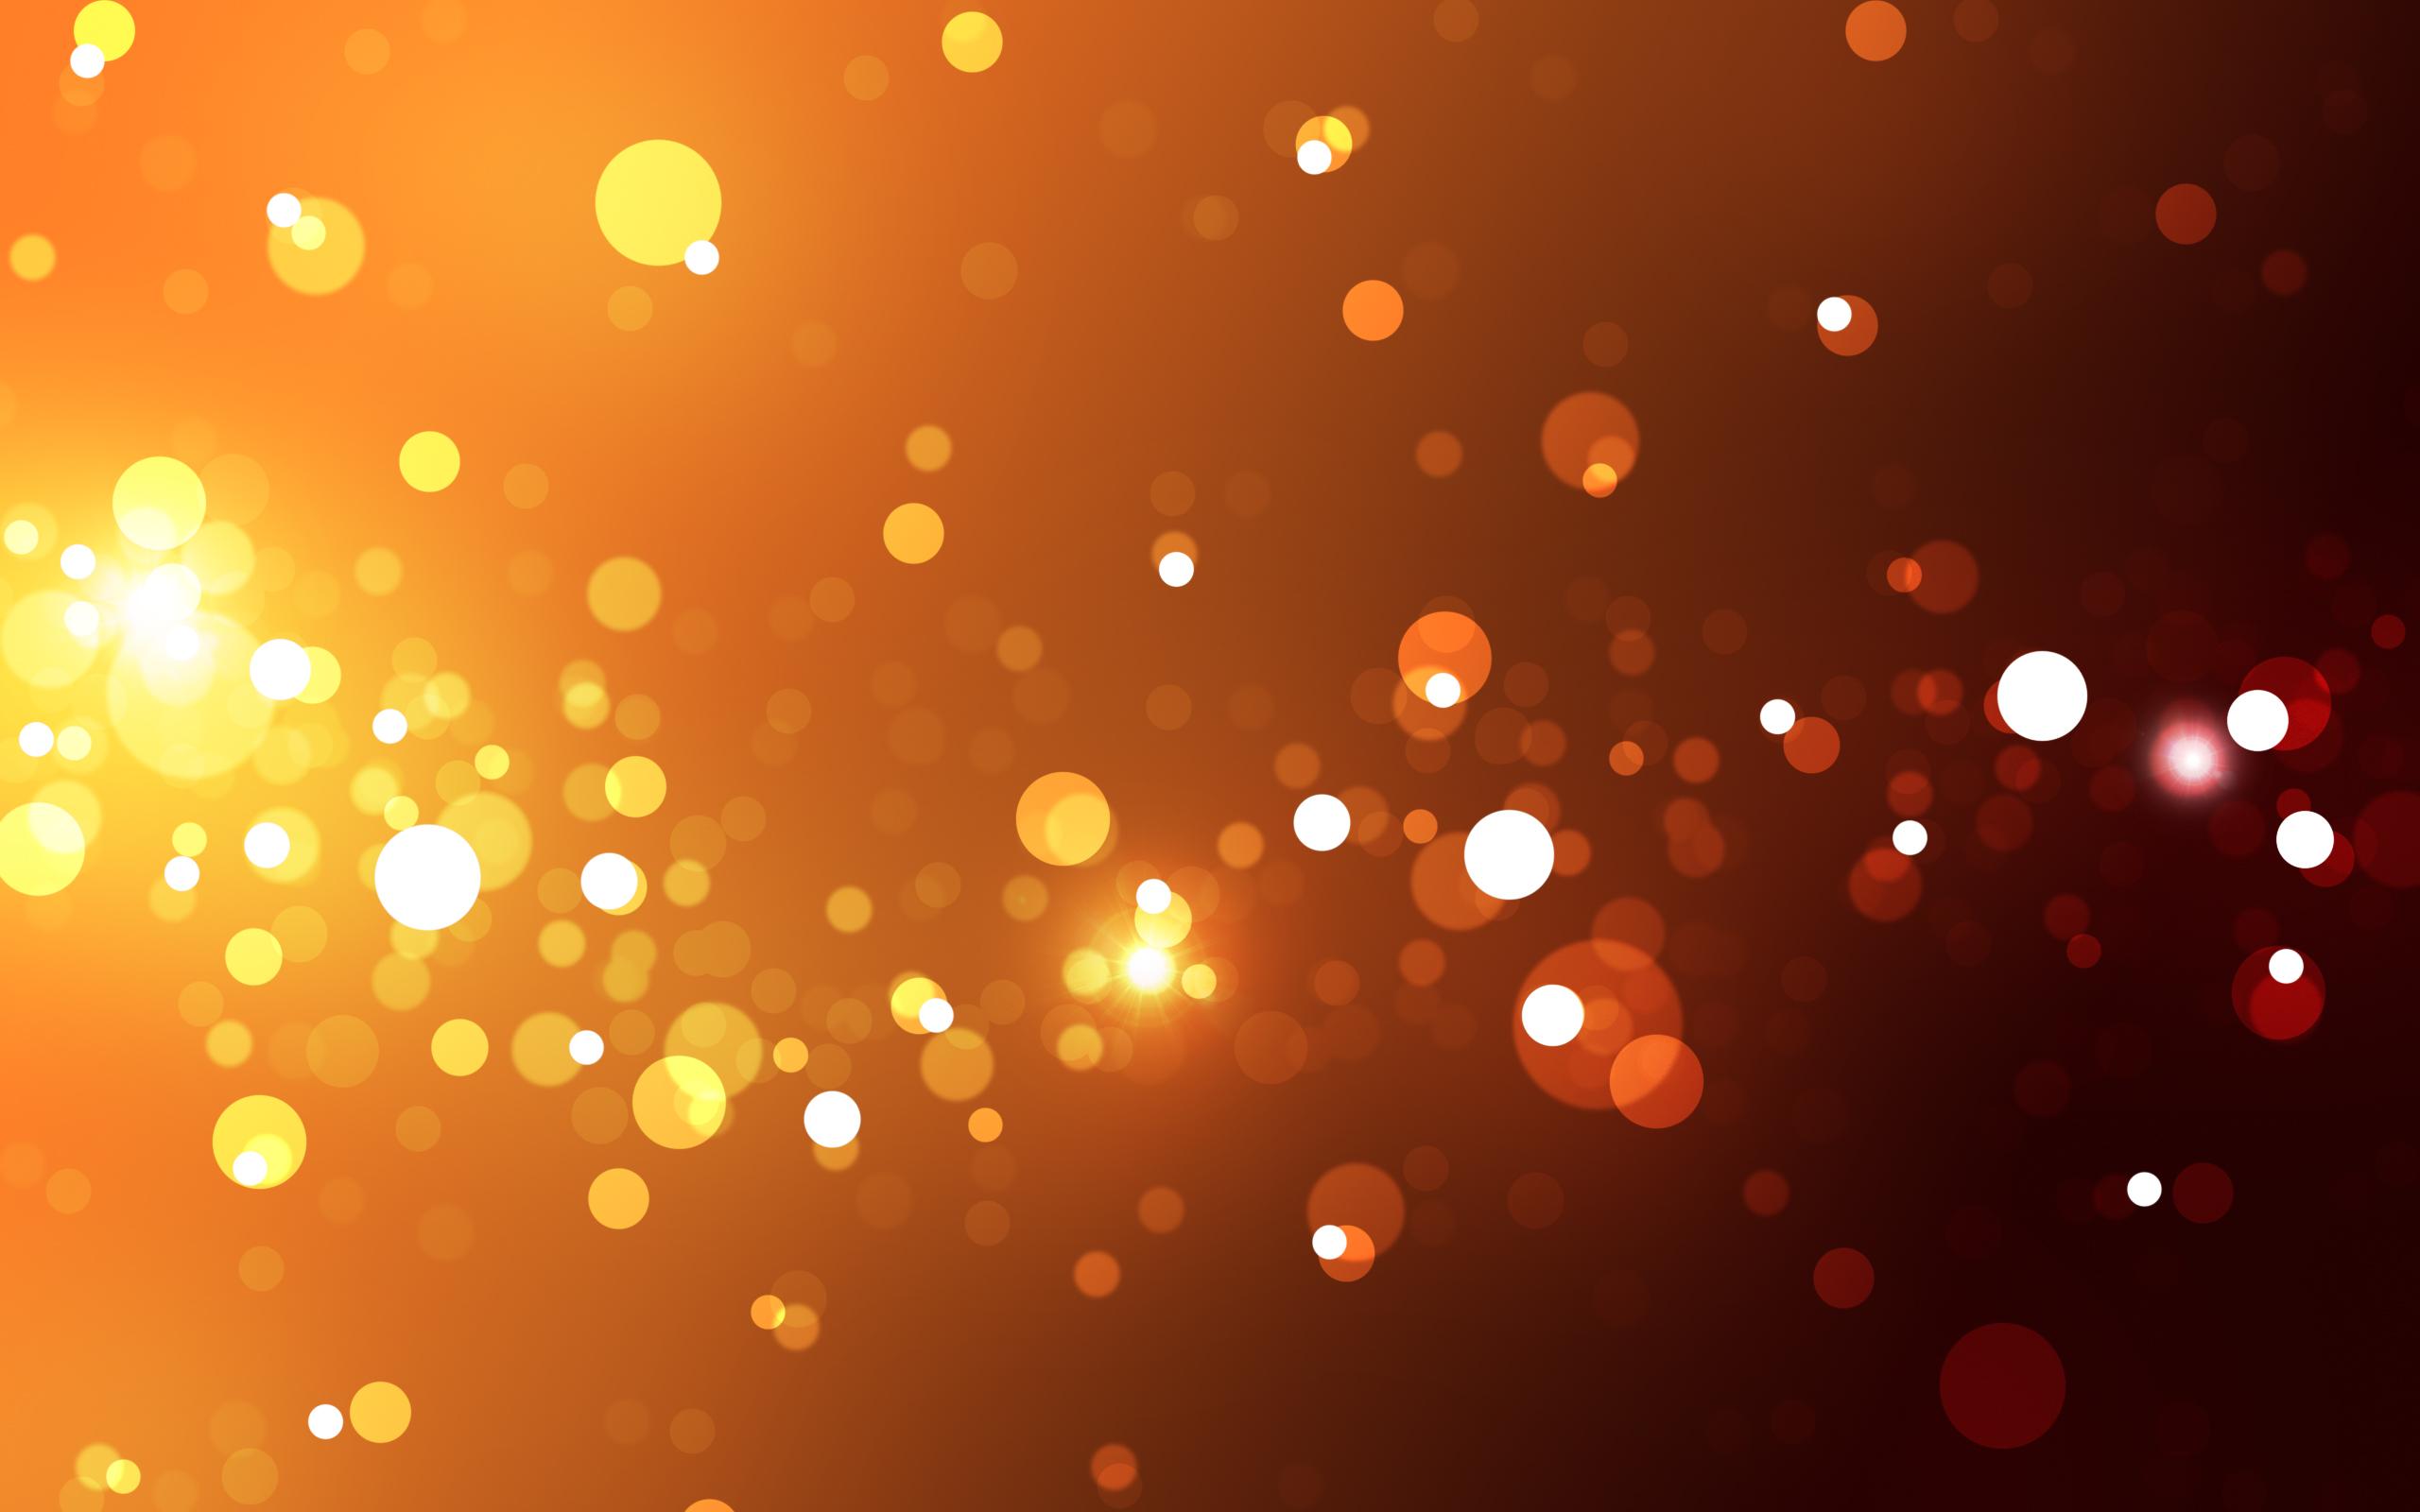 Abstract Lights Wallpaper 2560x1600 Abstract Lights Orange 2560x1600